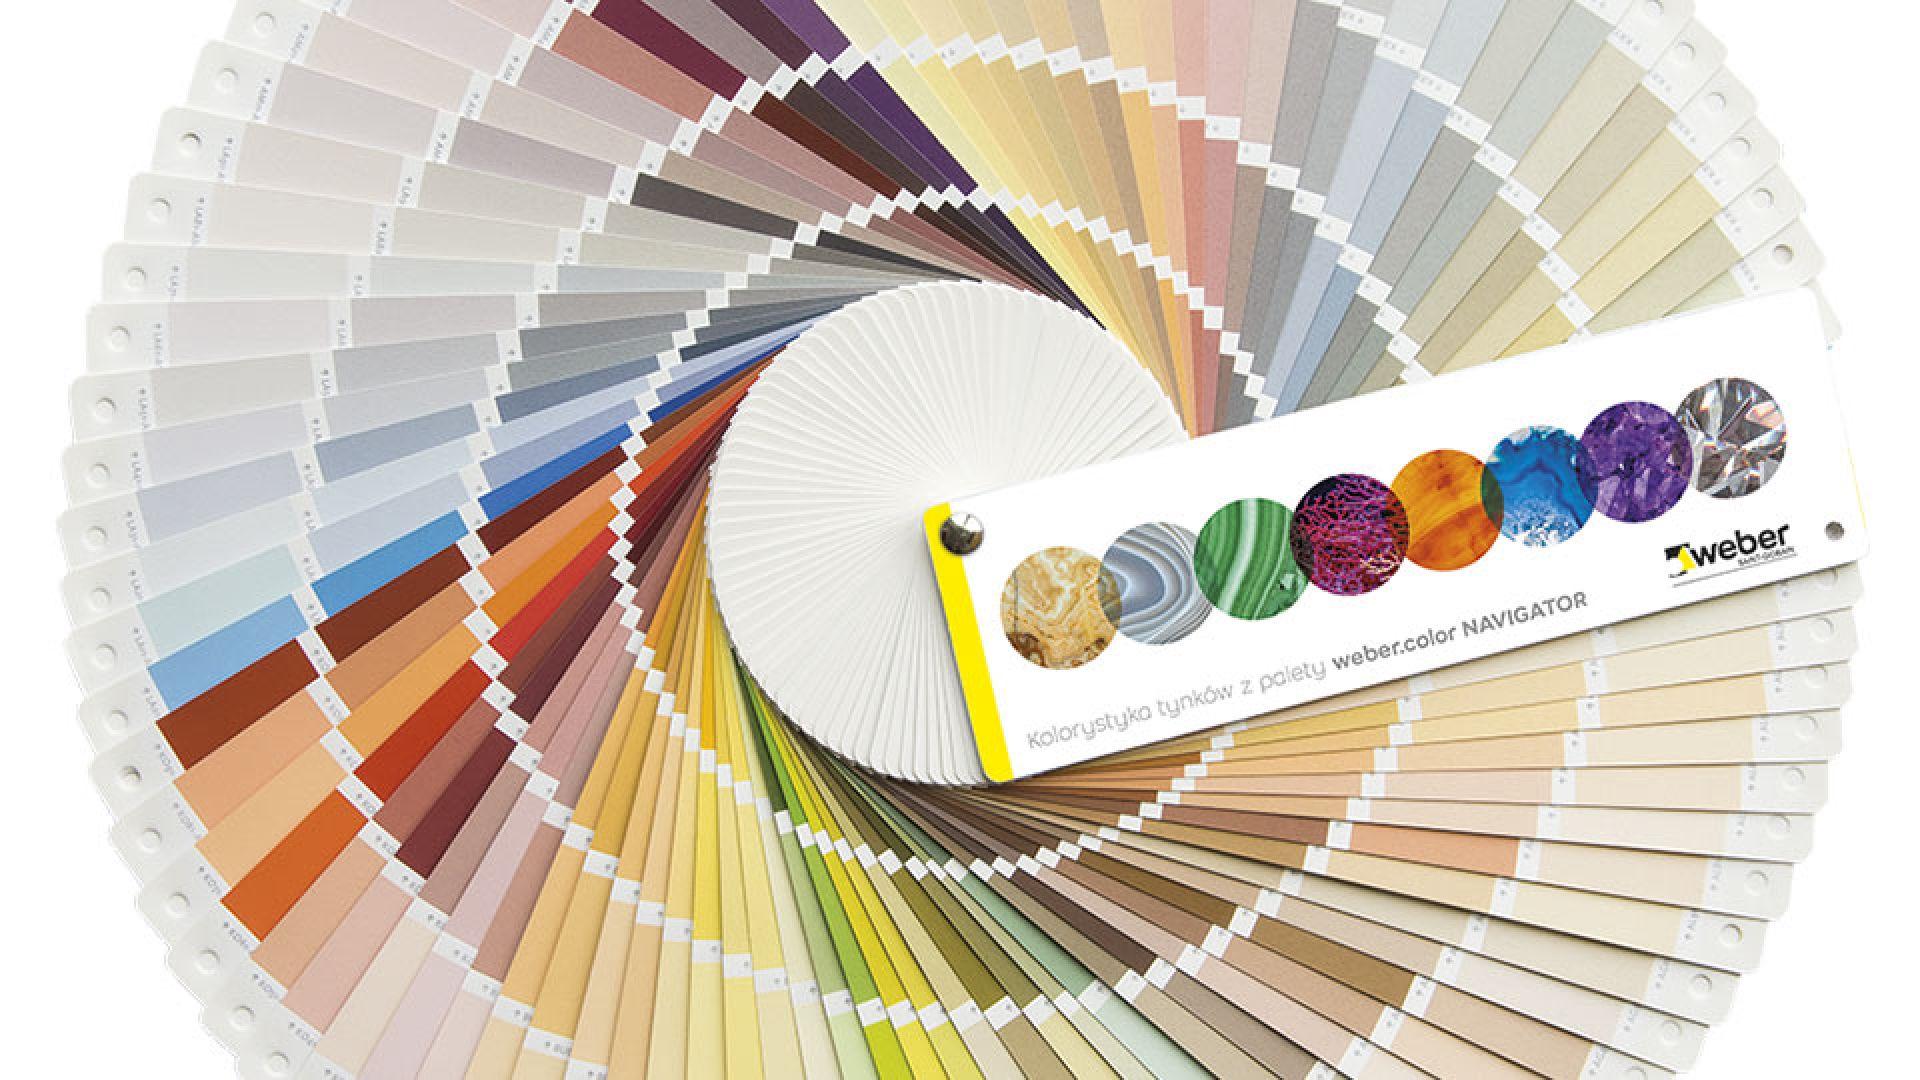 Jak Wybrac Kolor Tynku Weber